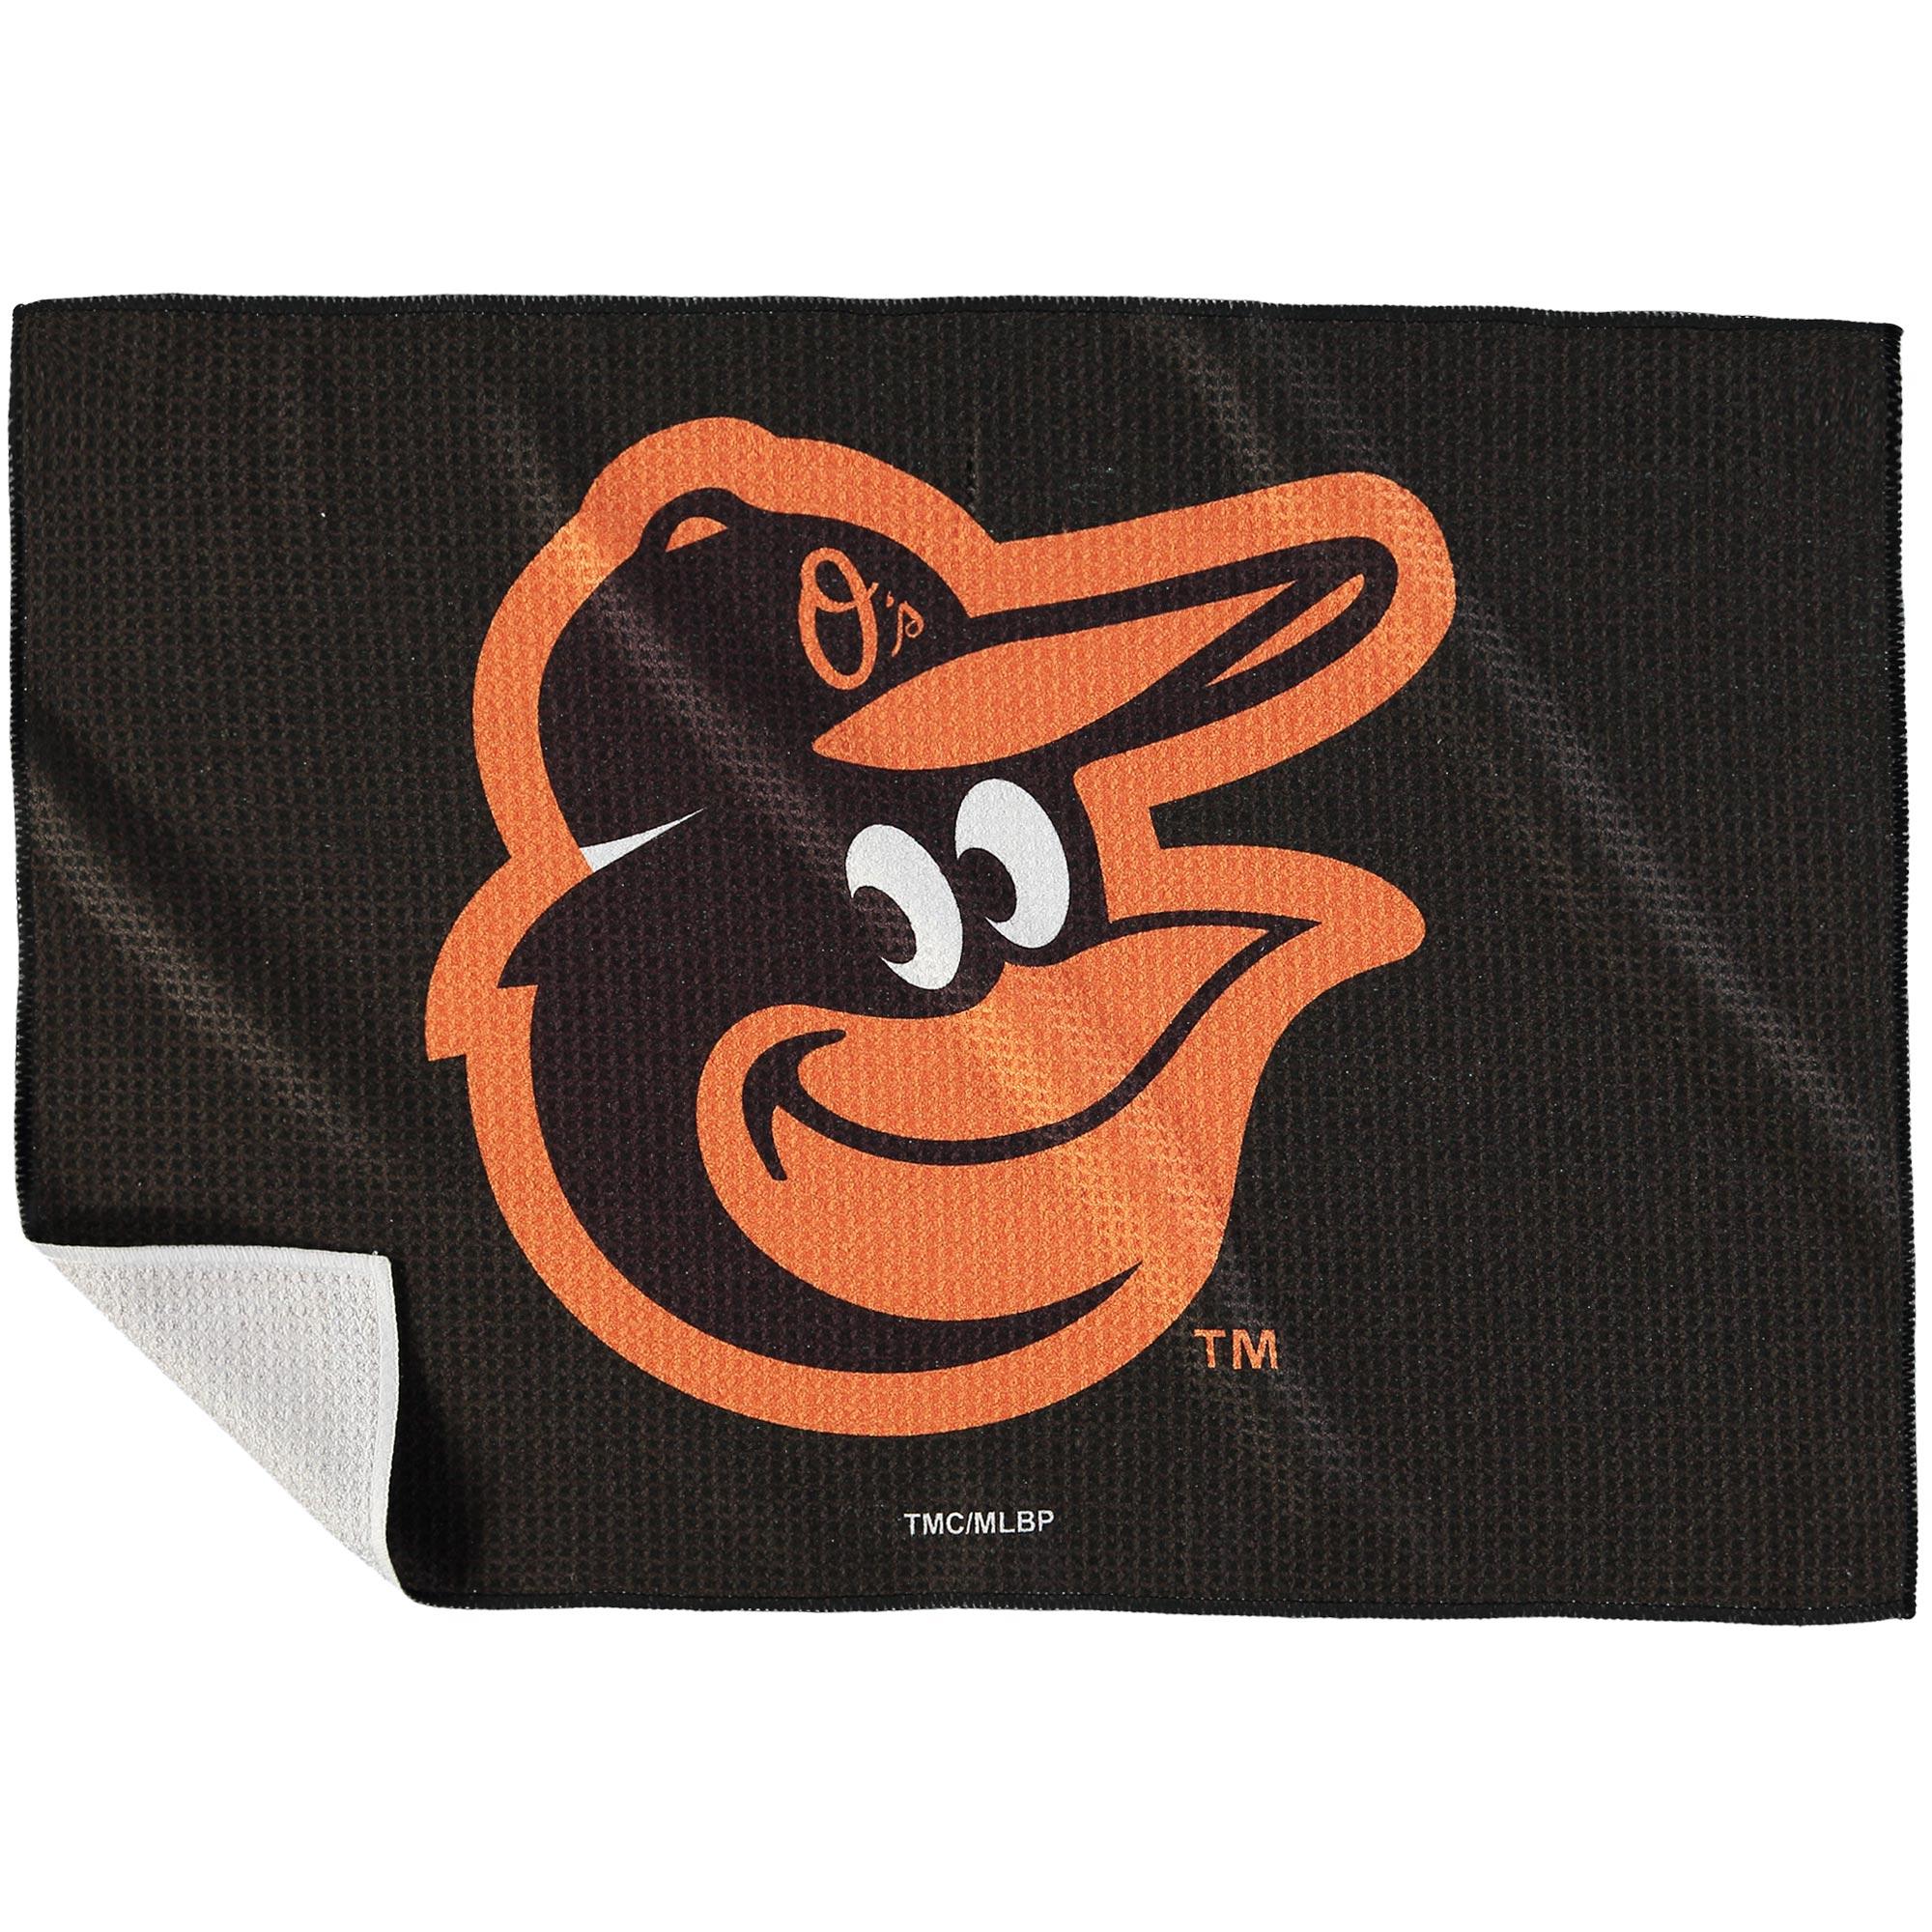 "Baltimore Orioles 16"" x 24"" Microfiber Towel - No Size"